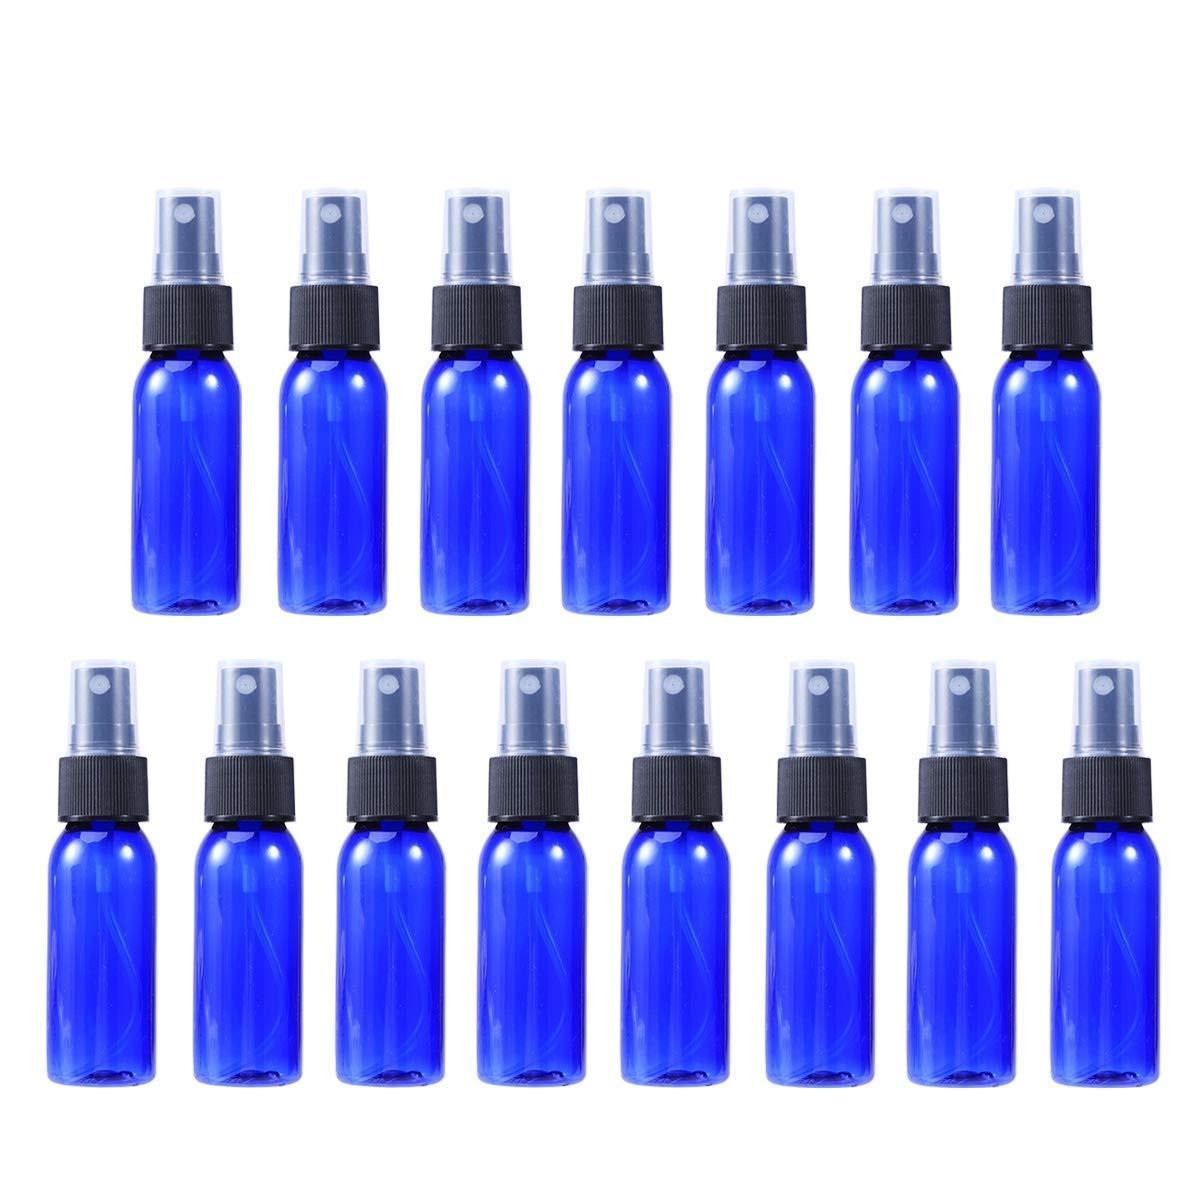 100373487e93 Frcolor Fine Mist Spray Bottle, Refillable Plastic Spray Bottles with Pumps  Cosmetic Spray Bottles for Essential Oils Liquids, 15 Pack